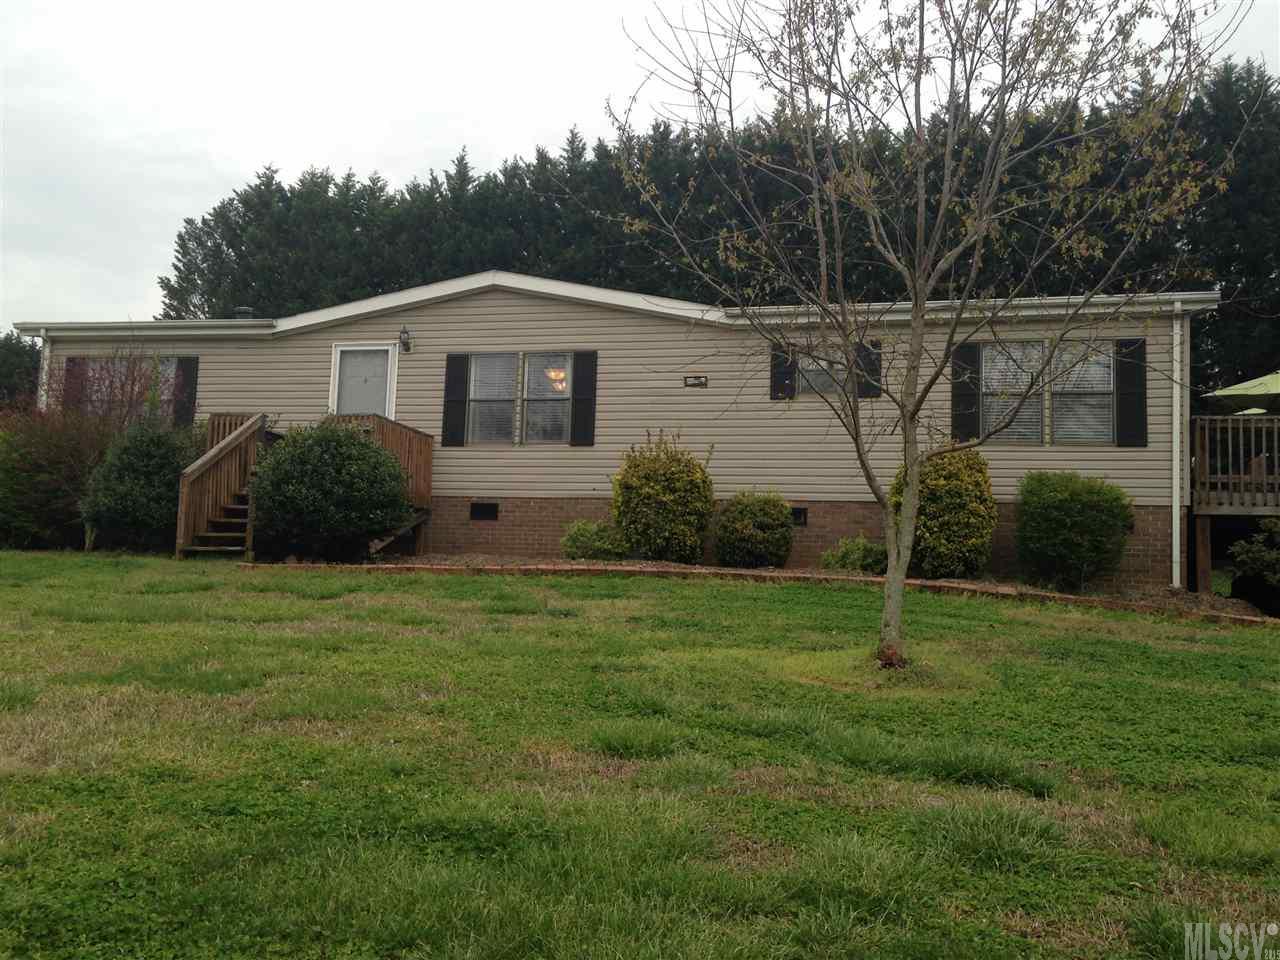 5352 Lee Cline Rd, Conover, NC 28613